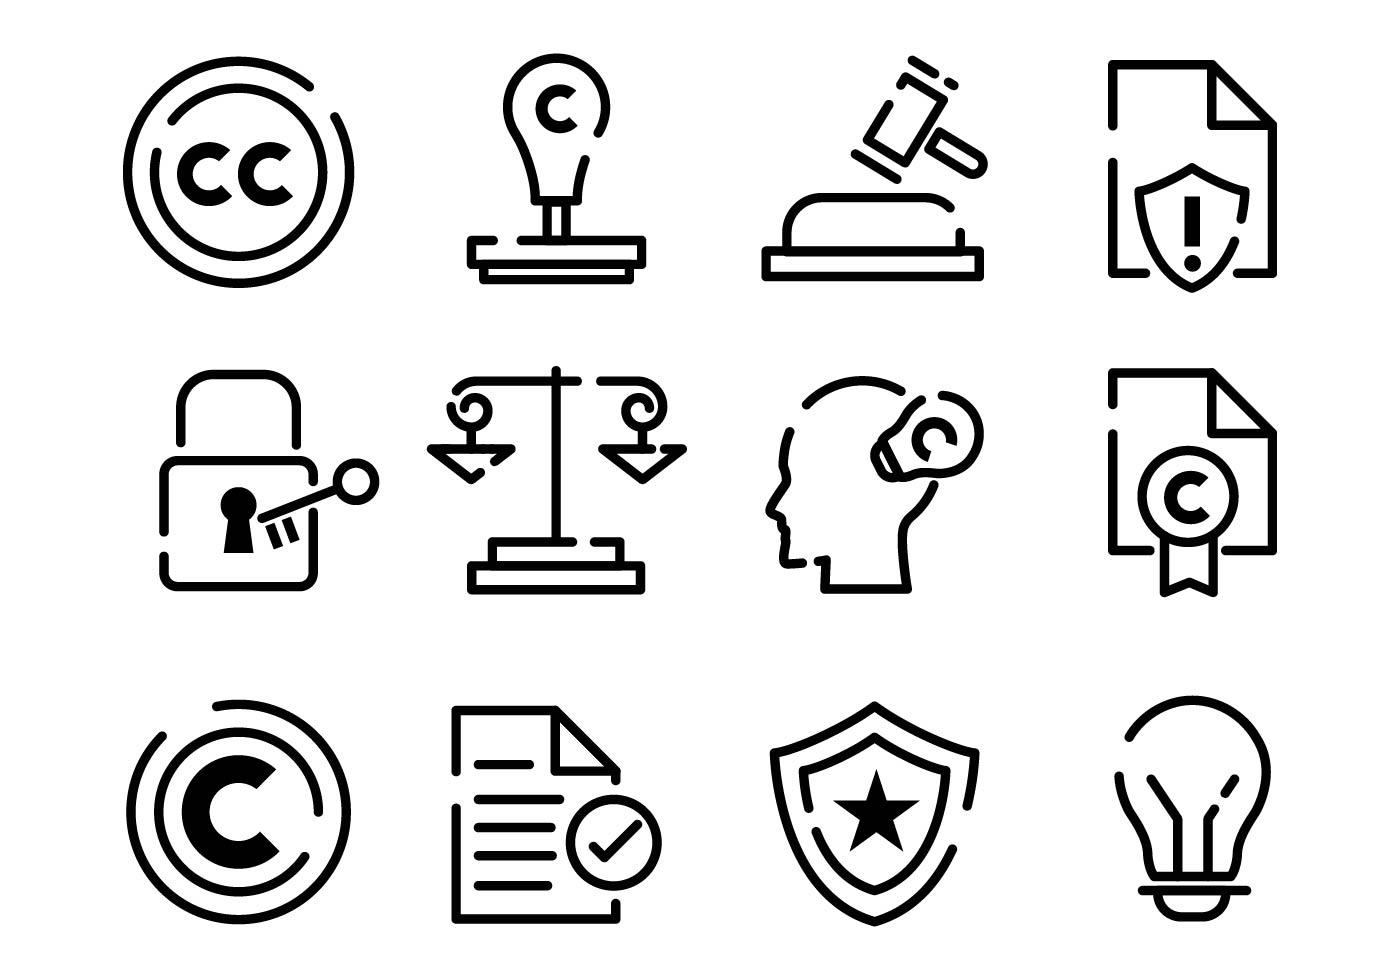 Creative Commons Free Vector Art